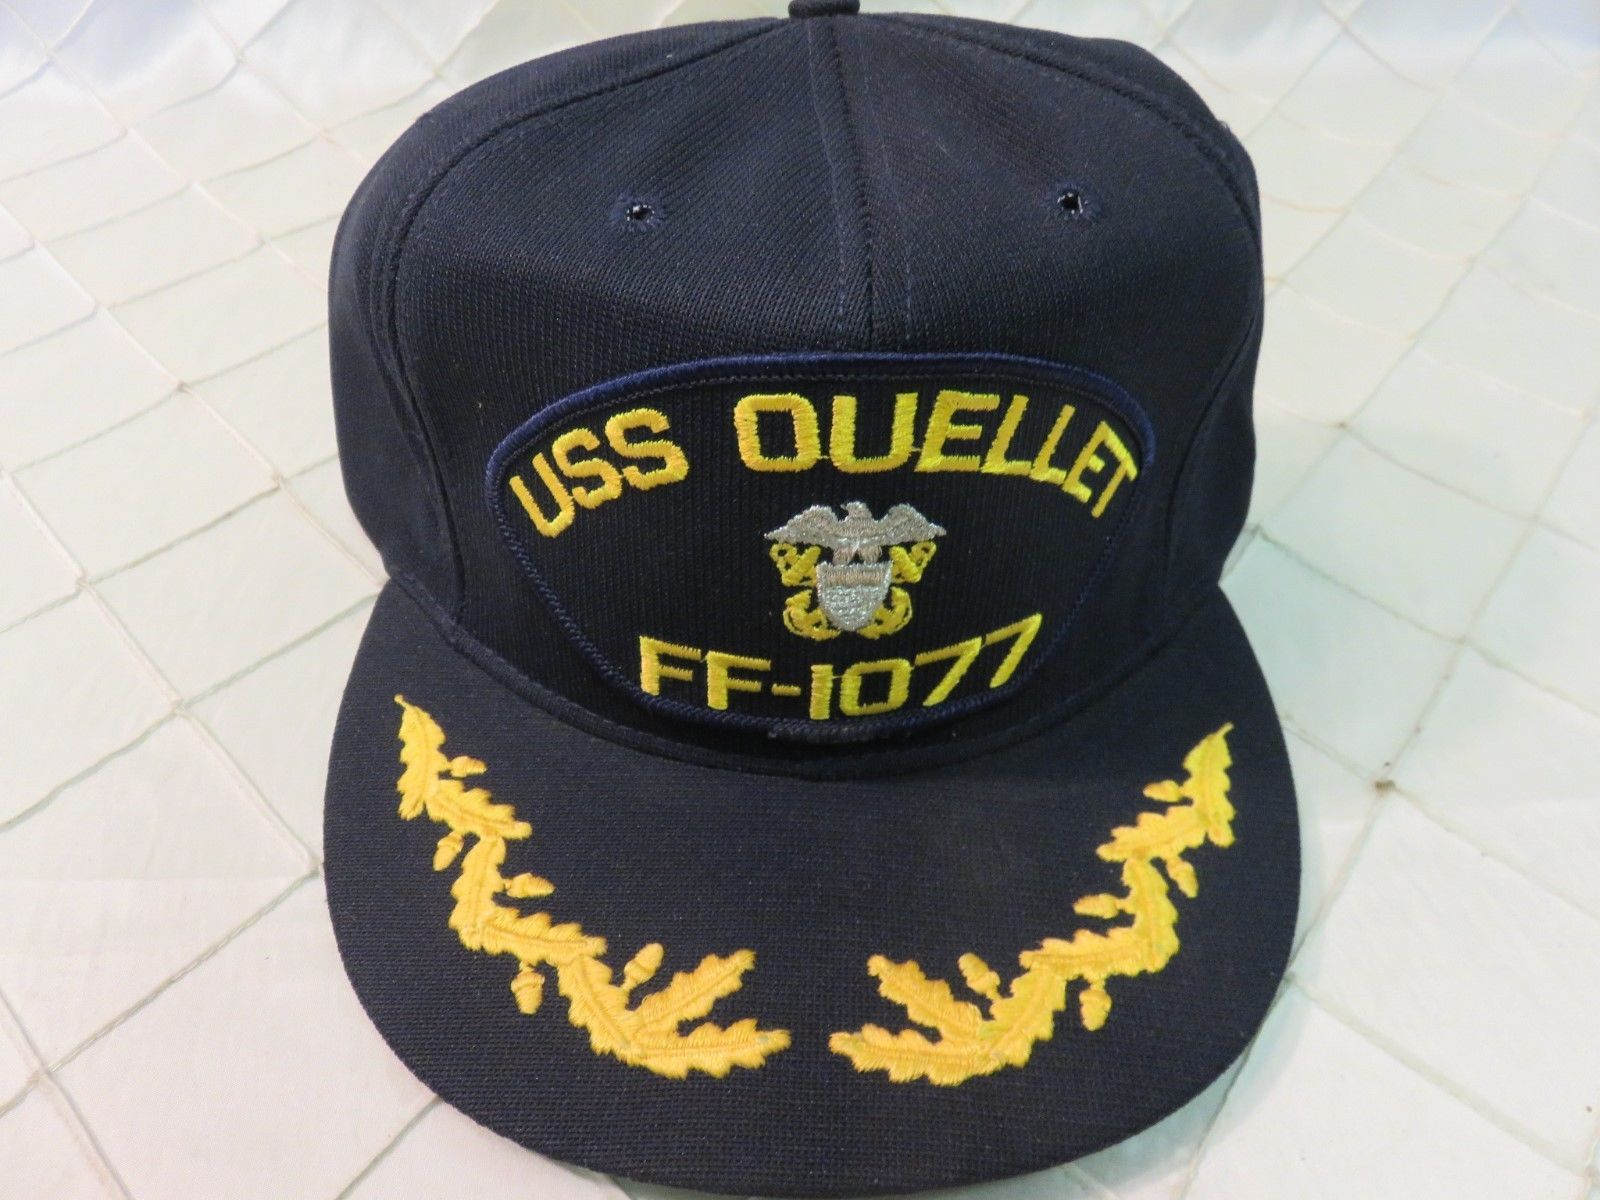 9e8f9dcfef4 USS OUELLET FF-1077 Navy Adjustable Military Snapback Trucker Ballcap Hat  Cap